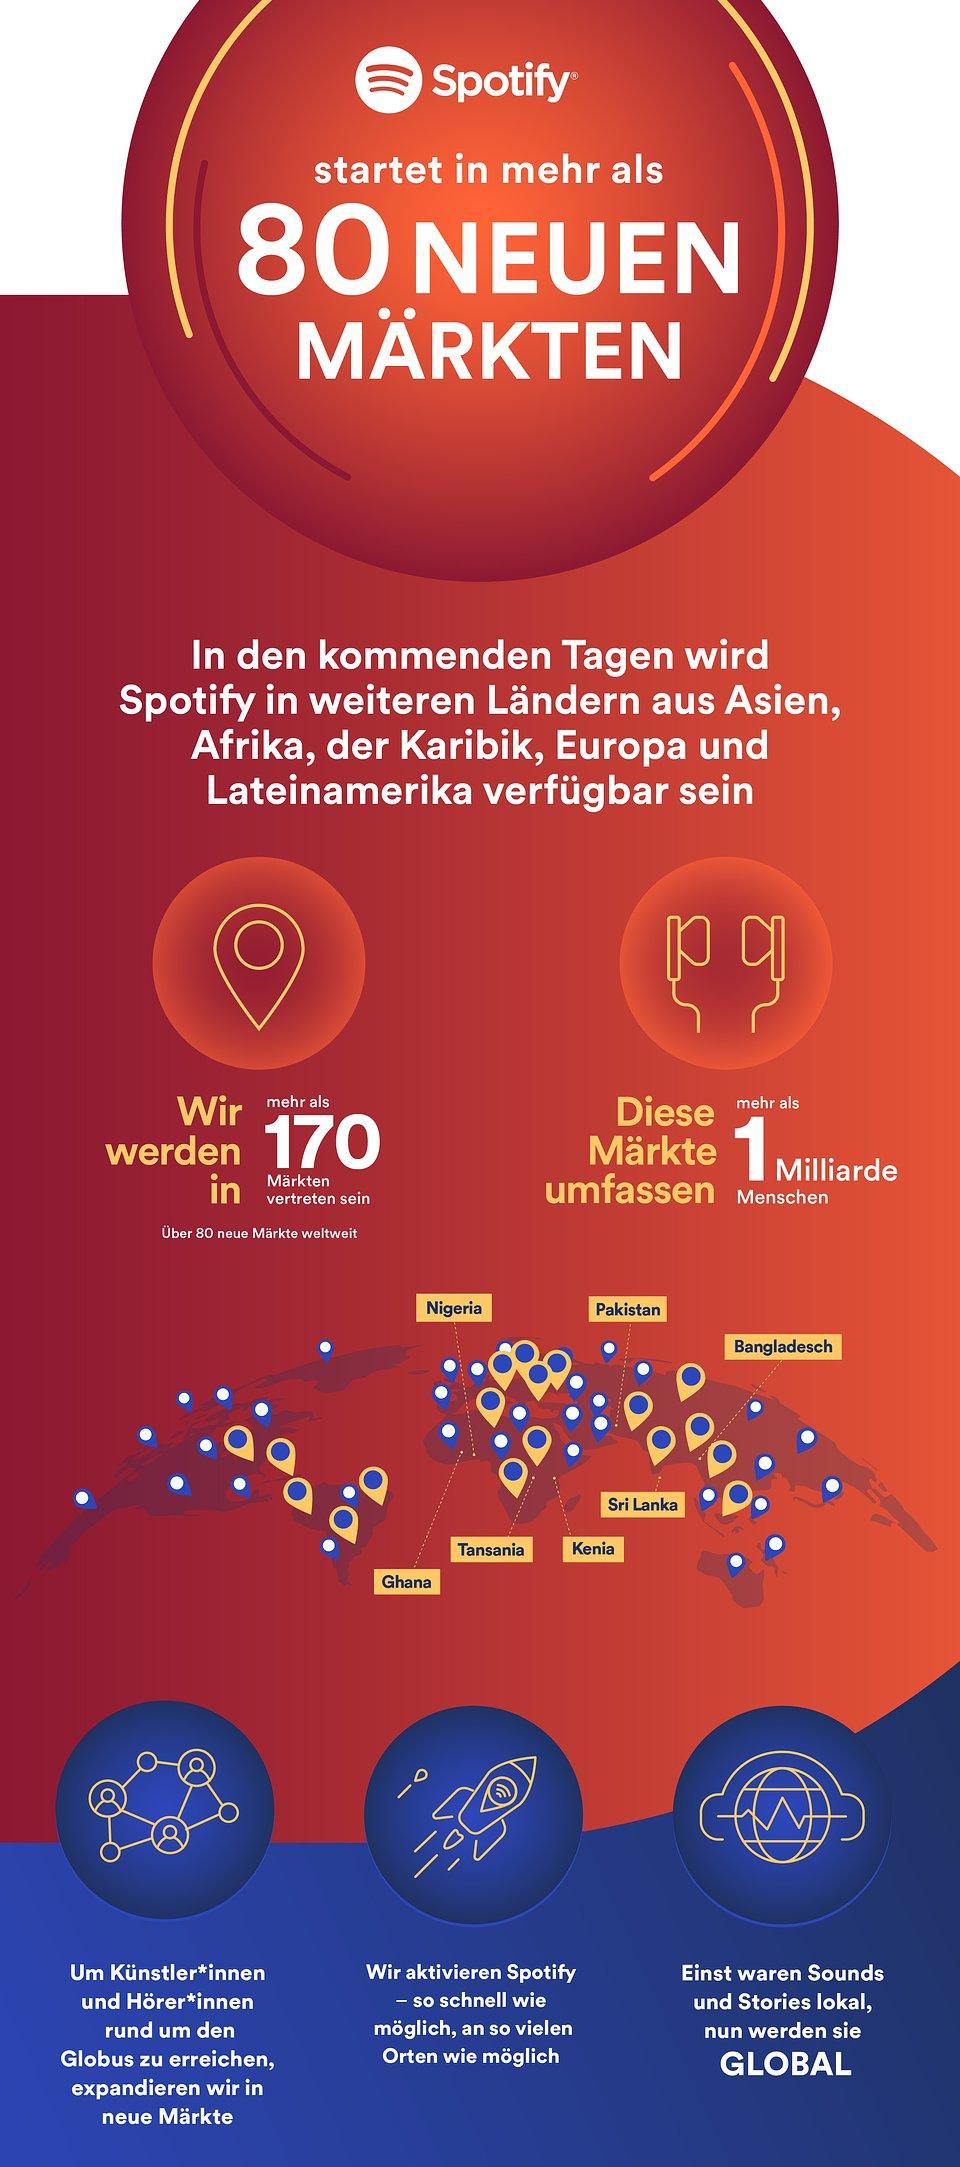 Spotify_NeueMärkte_infographic.jpg